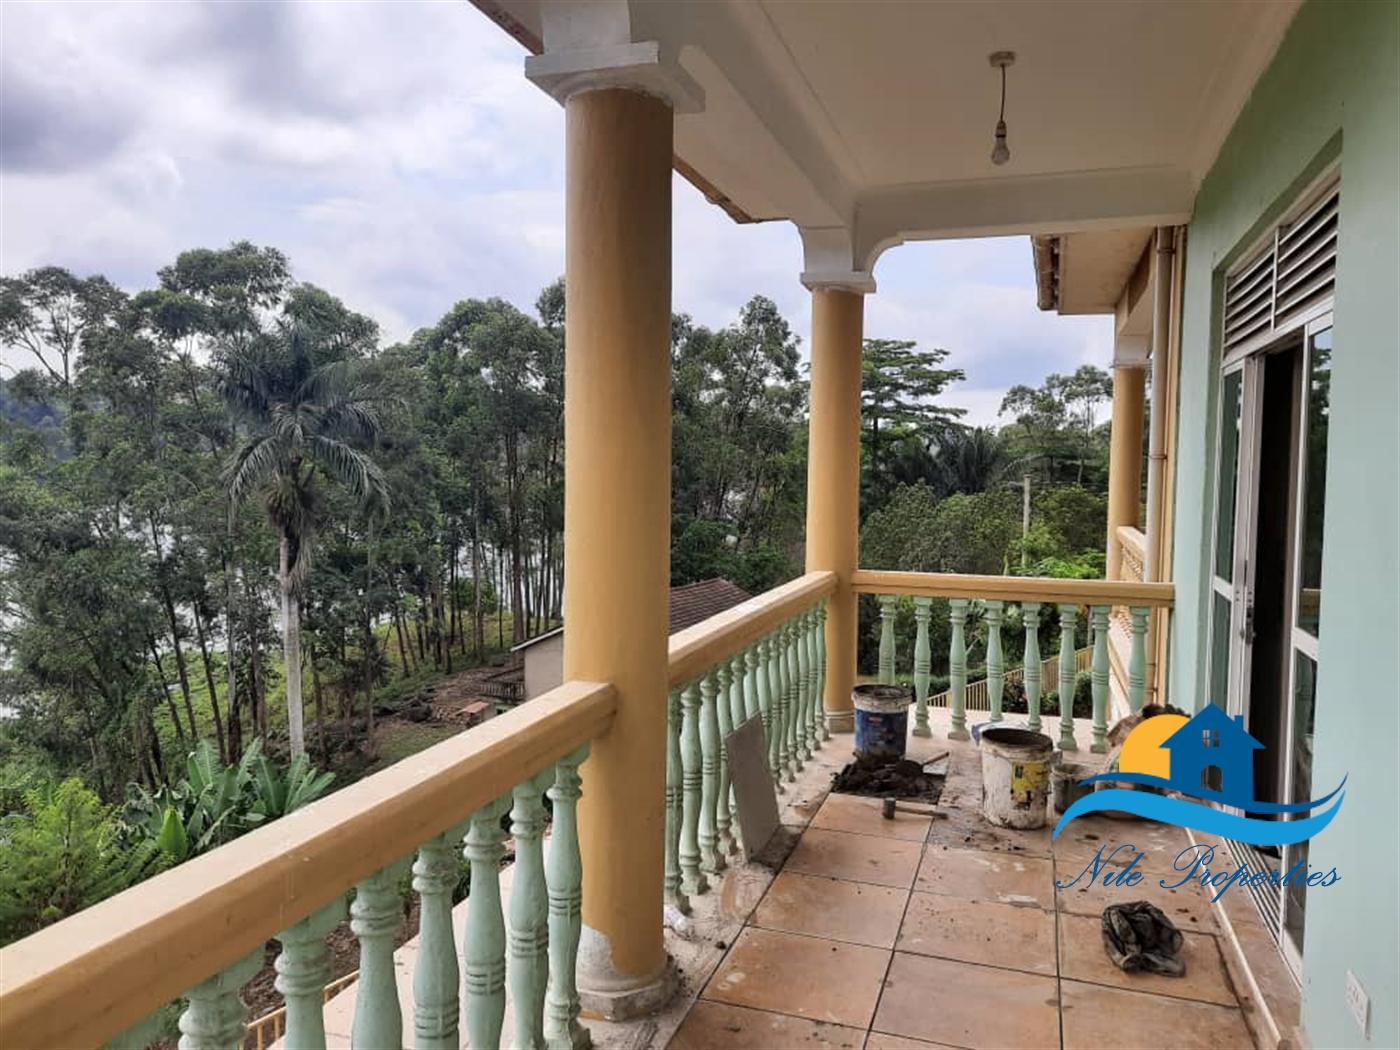 Bungalow for rent in Jinja Jinja